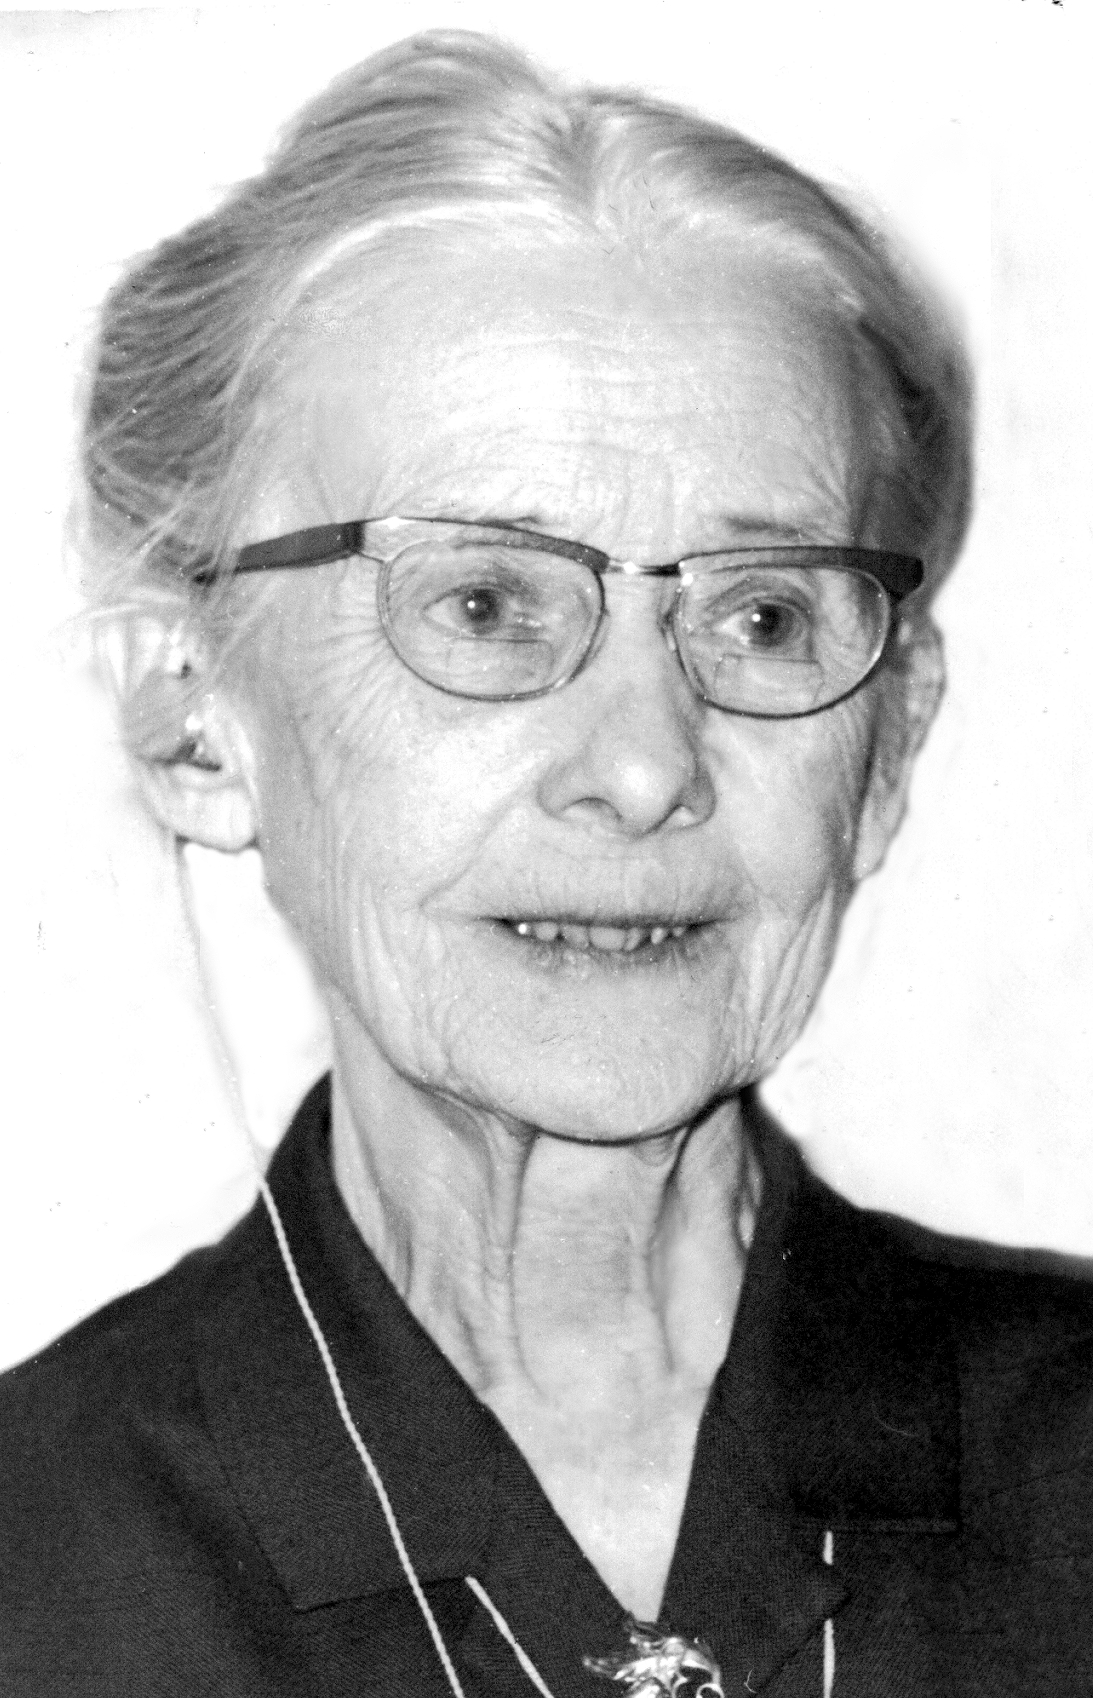 Elsa Karlsson, photographer and year unknown. Örebromissionens arkiv, ArkivCentrum Örebro län